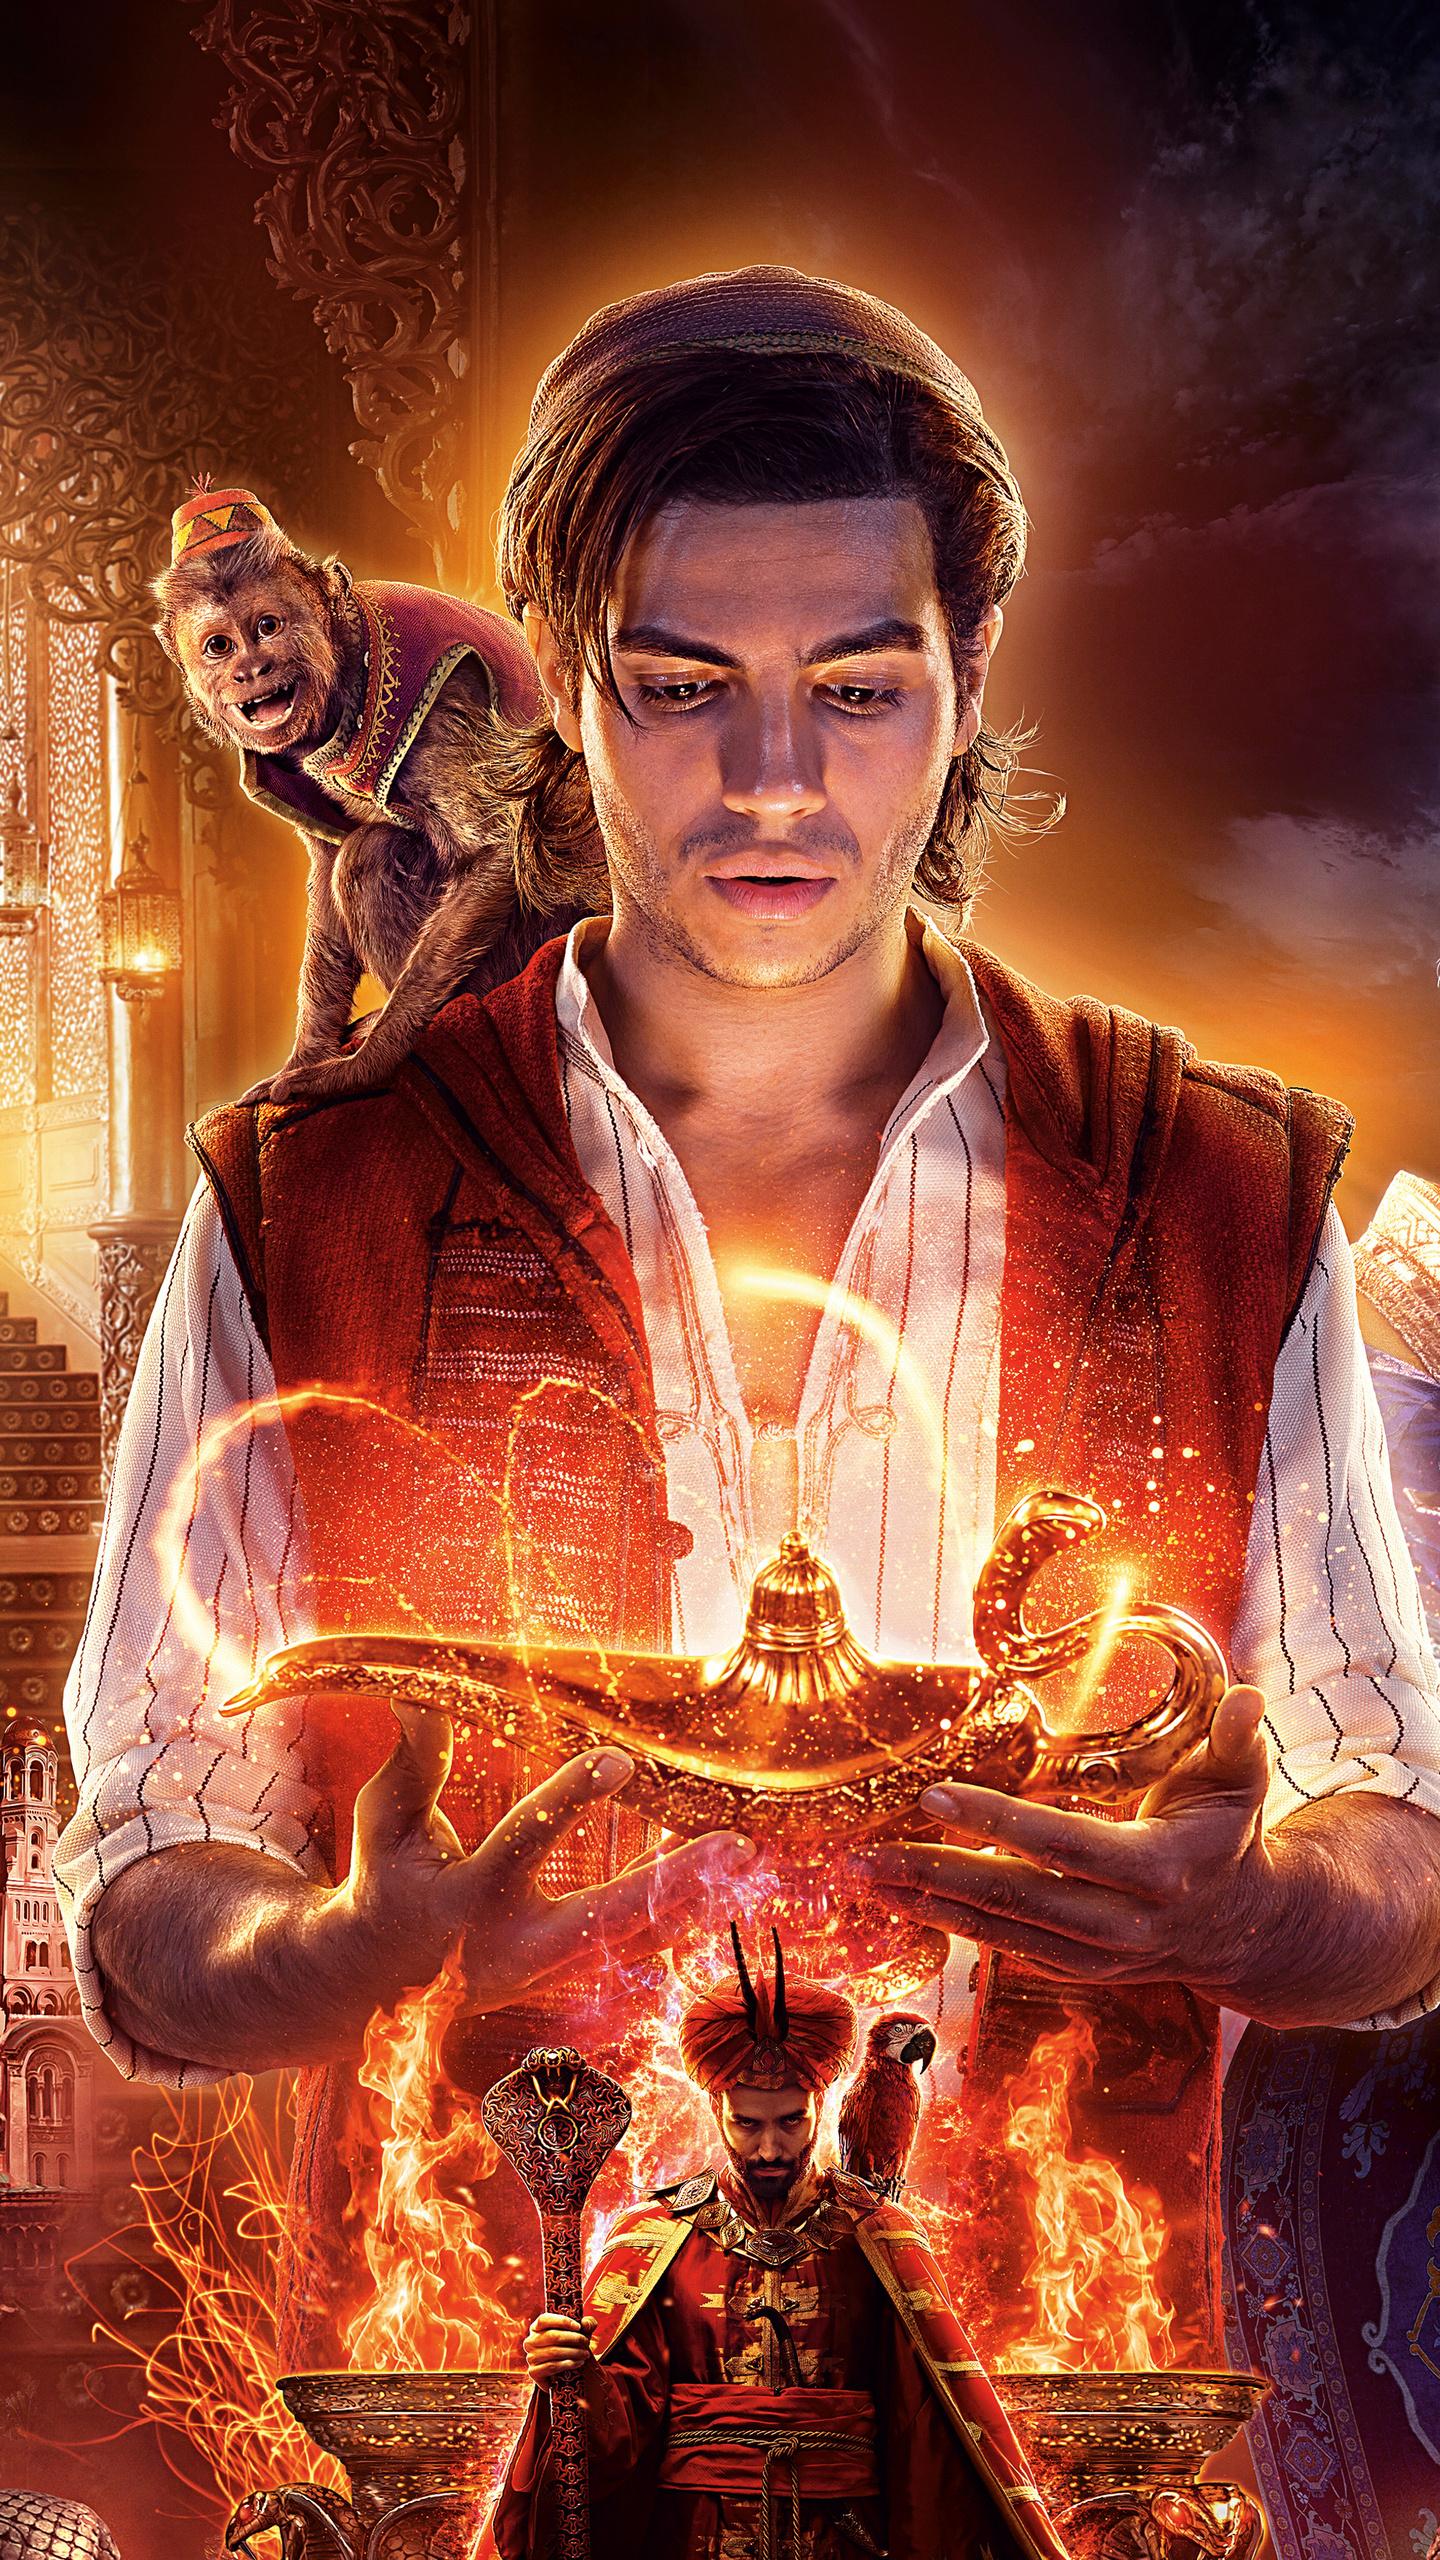 Aladdin wallpaper 2019 hd free photo and wallpaper - Aladdin 2019 poster ...